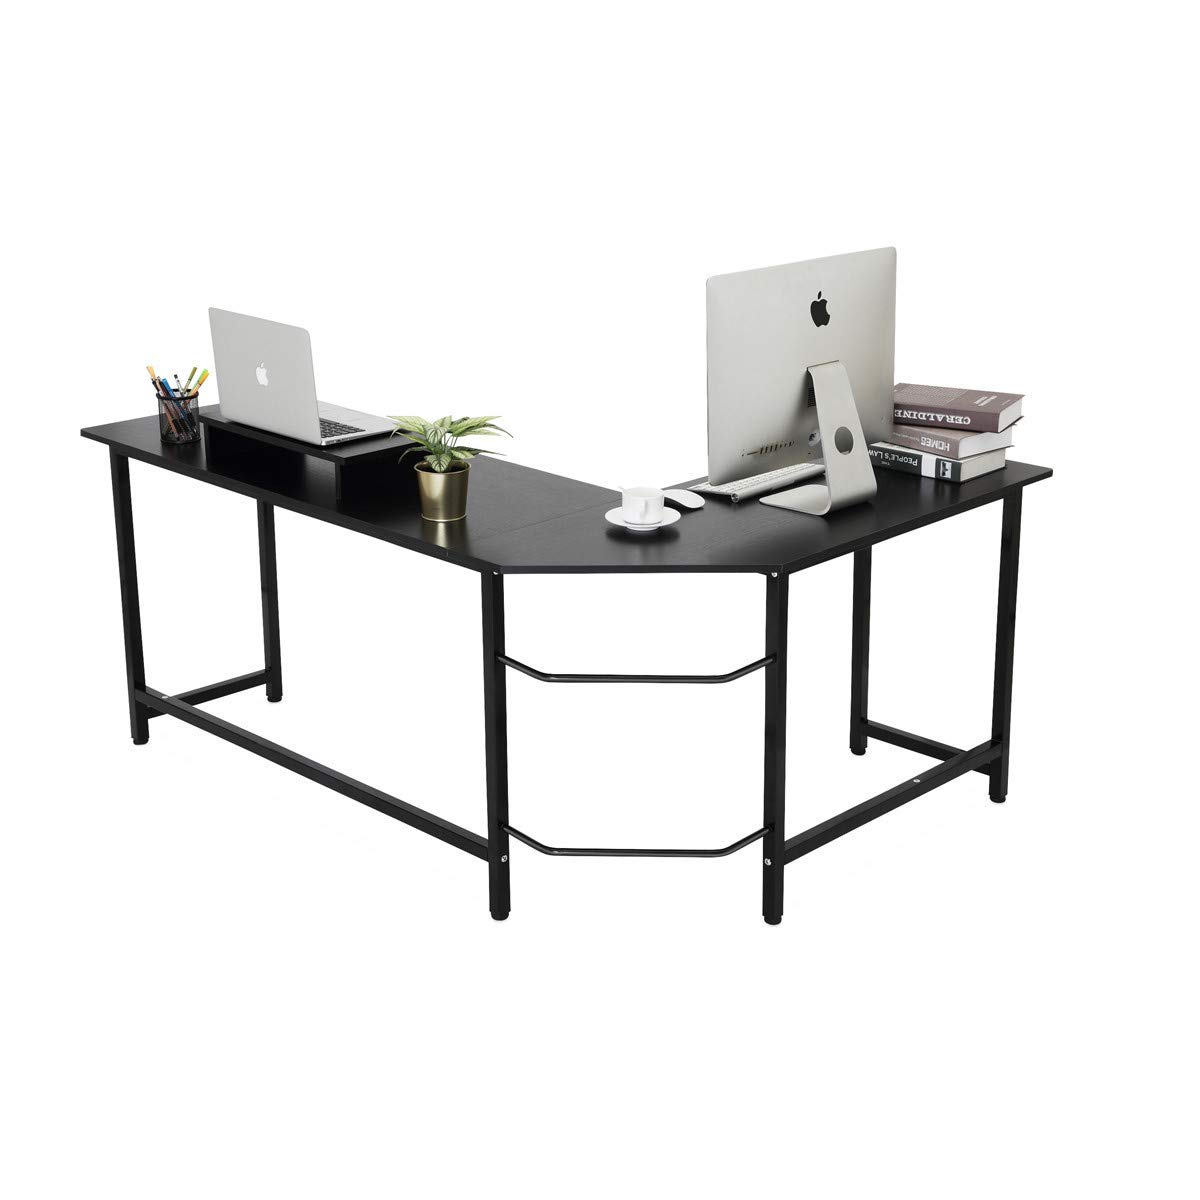 Modern Simple Style Desk for Home Office Coleshome Computer Desk 31 Sturdy Writing Desk,Teak